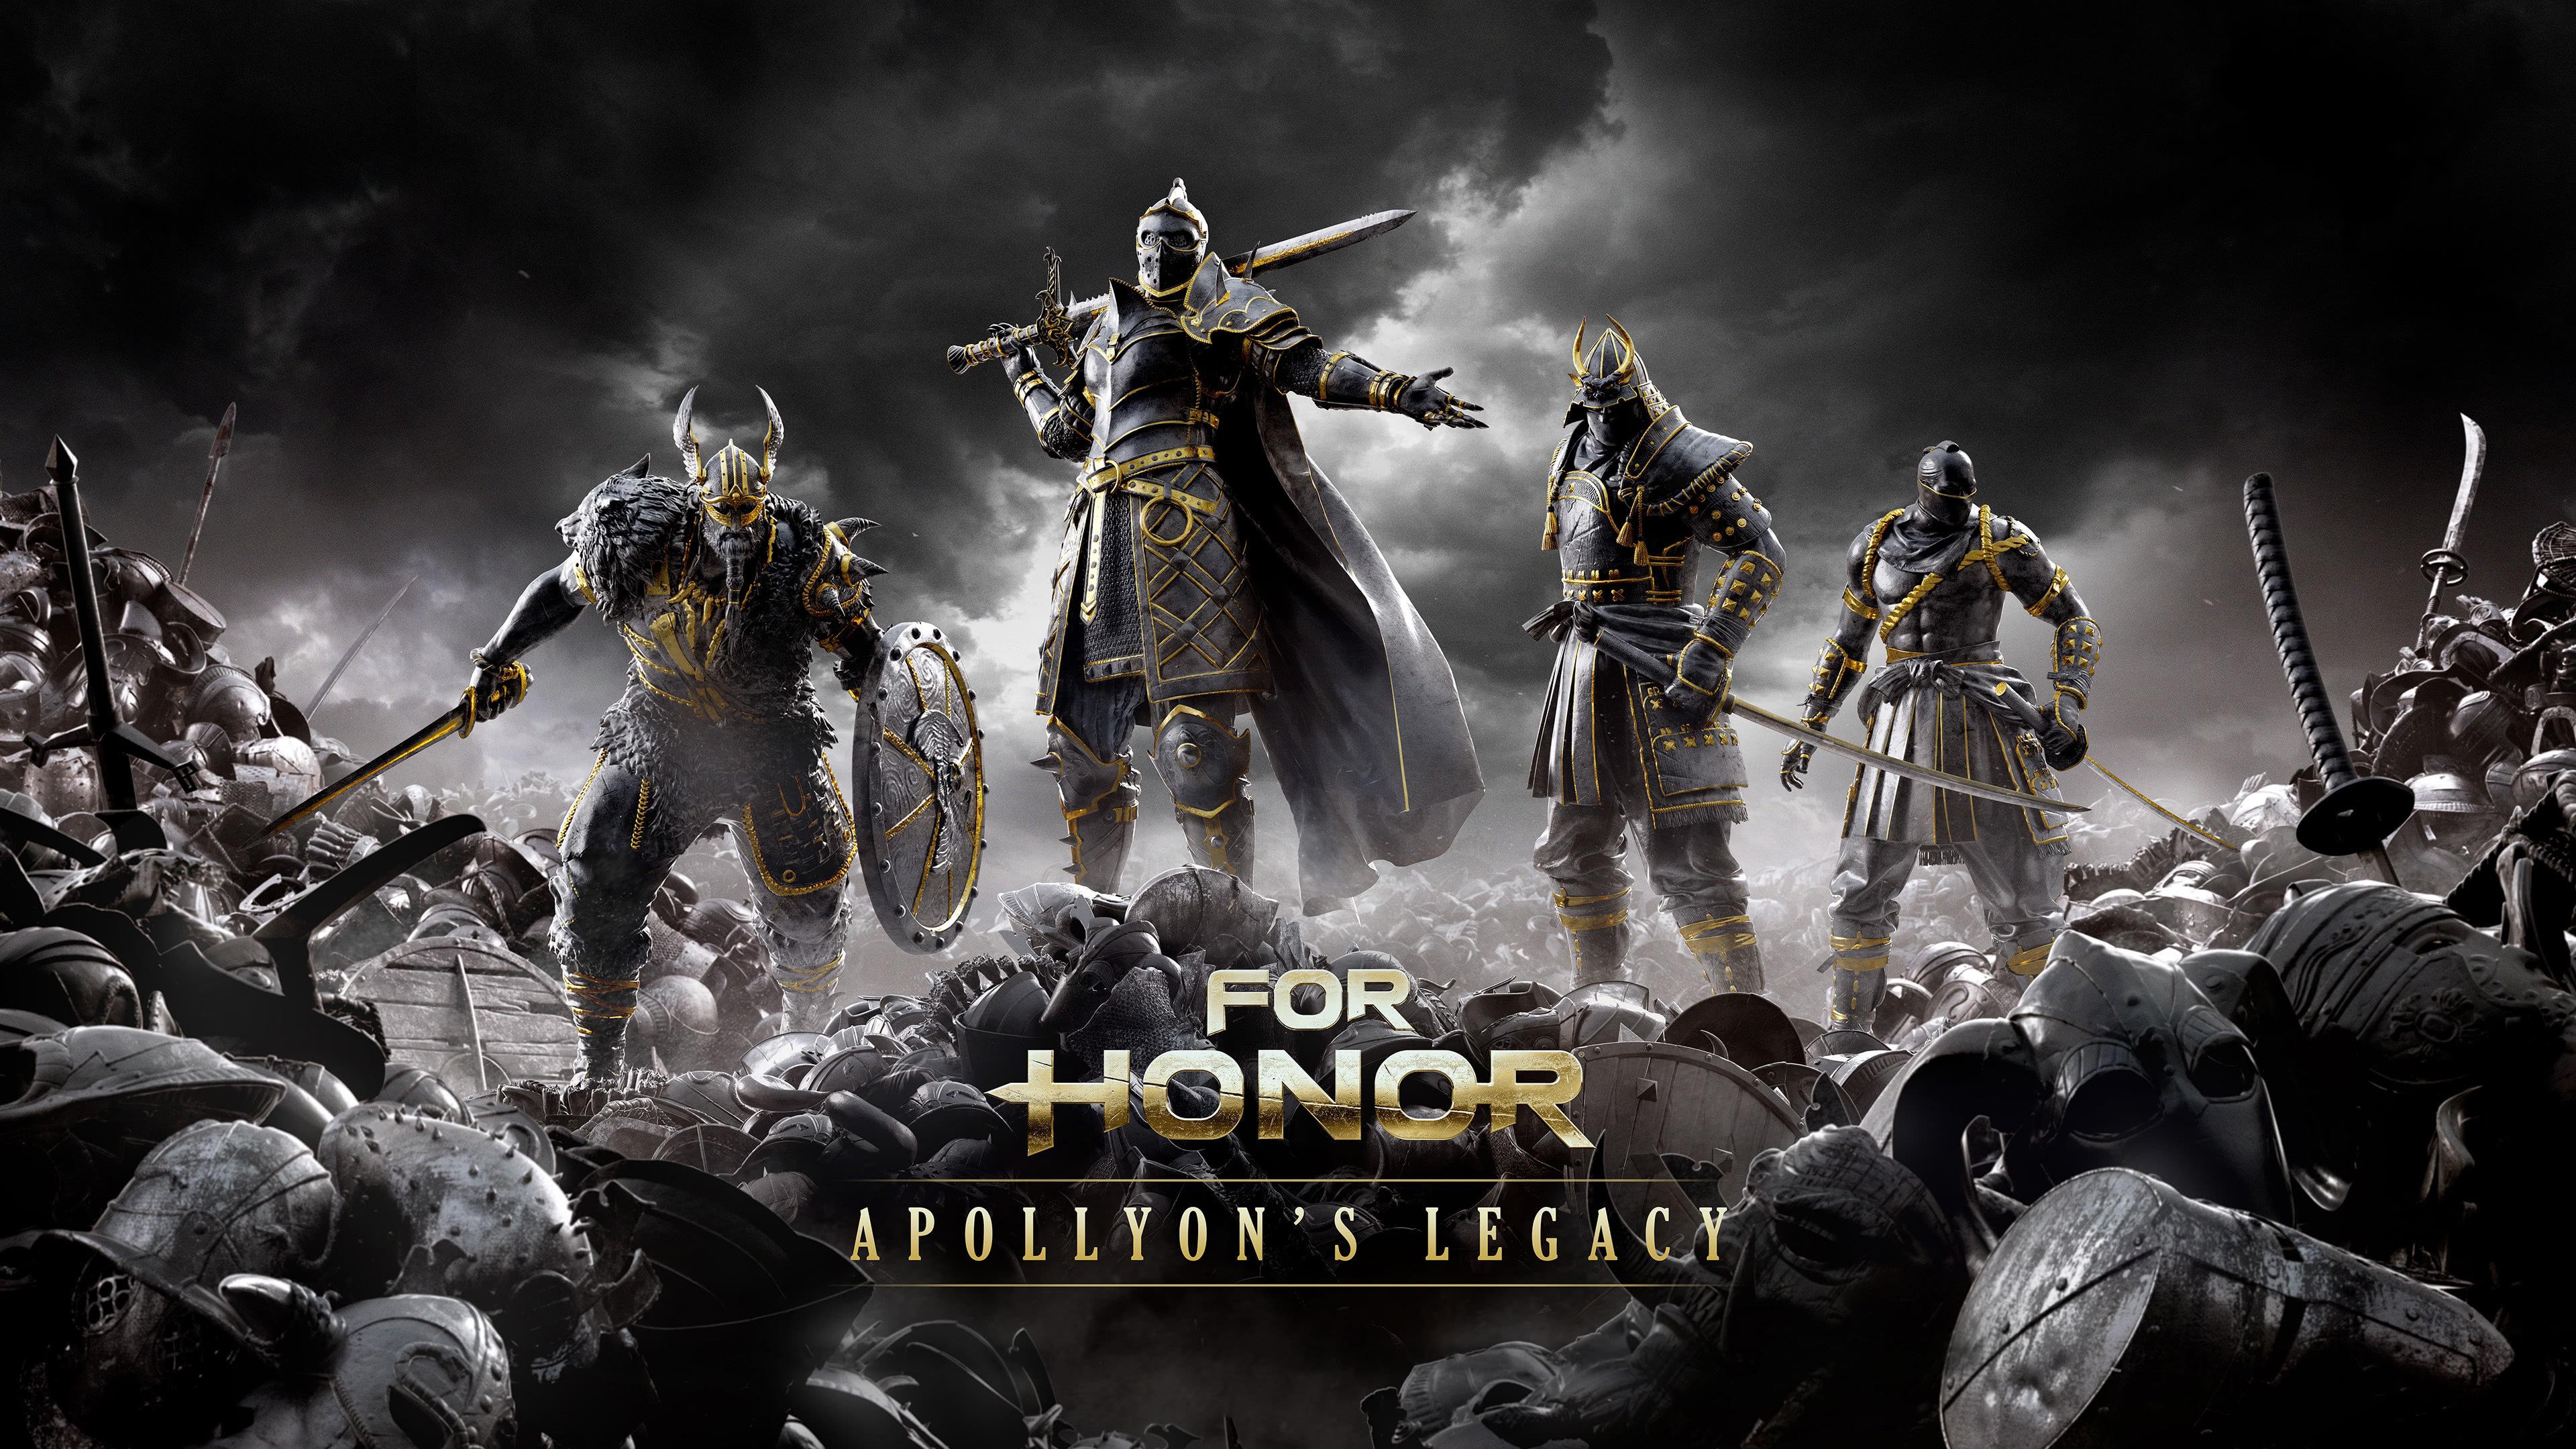 For Honor Season 5 Apollyons Legacy UHD 4K Wallpaper | Pixelz